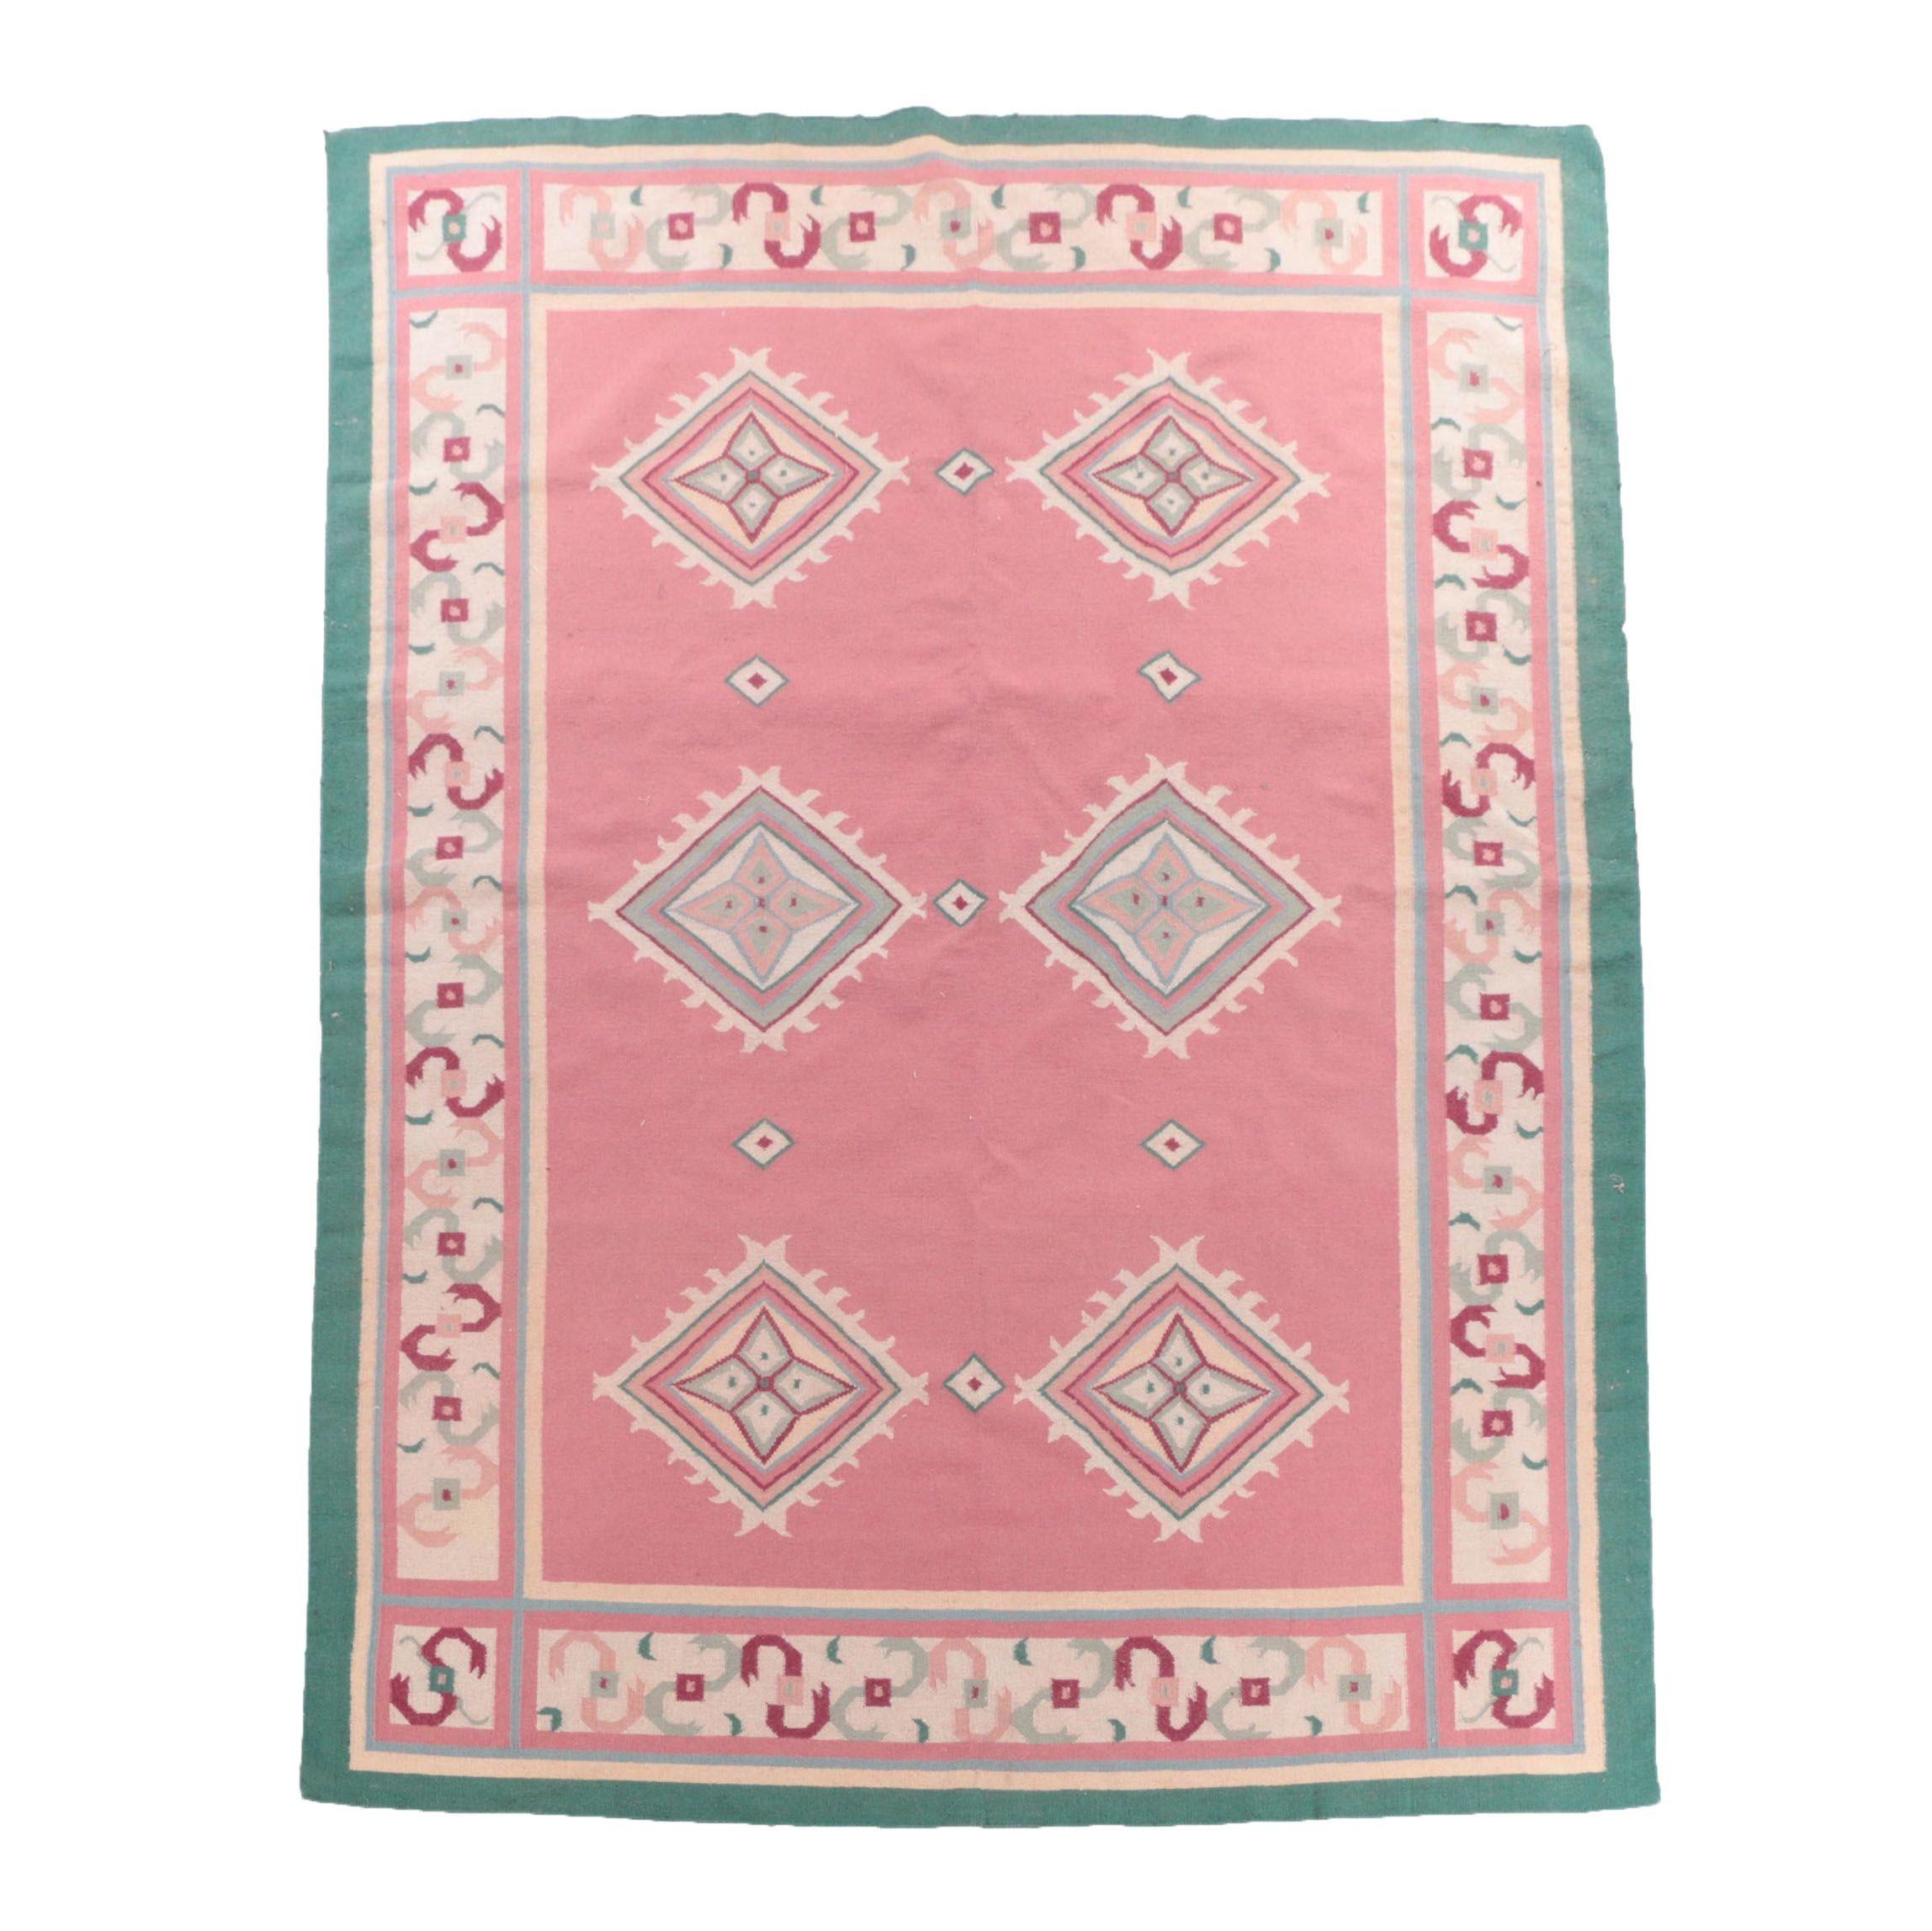 Handwoven Indian Dhurrie Wool Area Rug